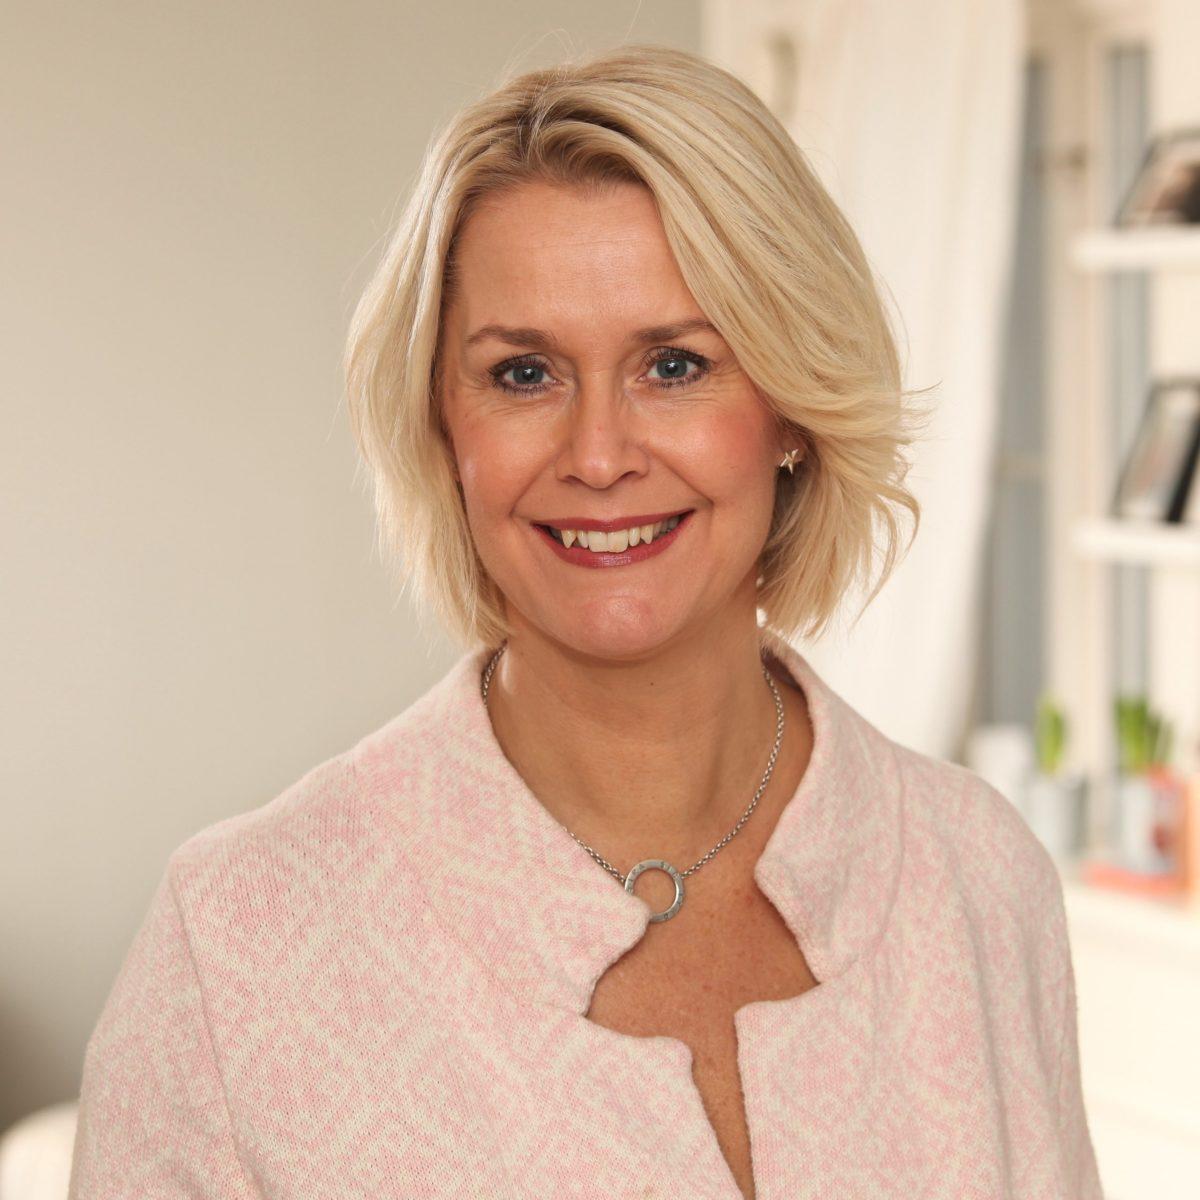 Jessica Grundström Ahldin